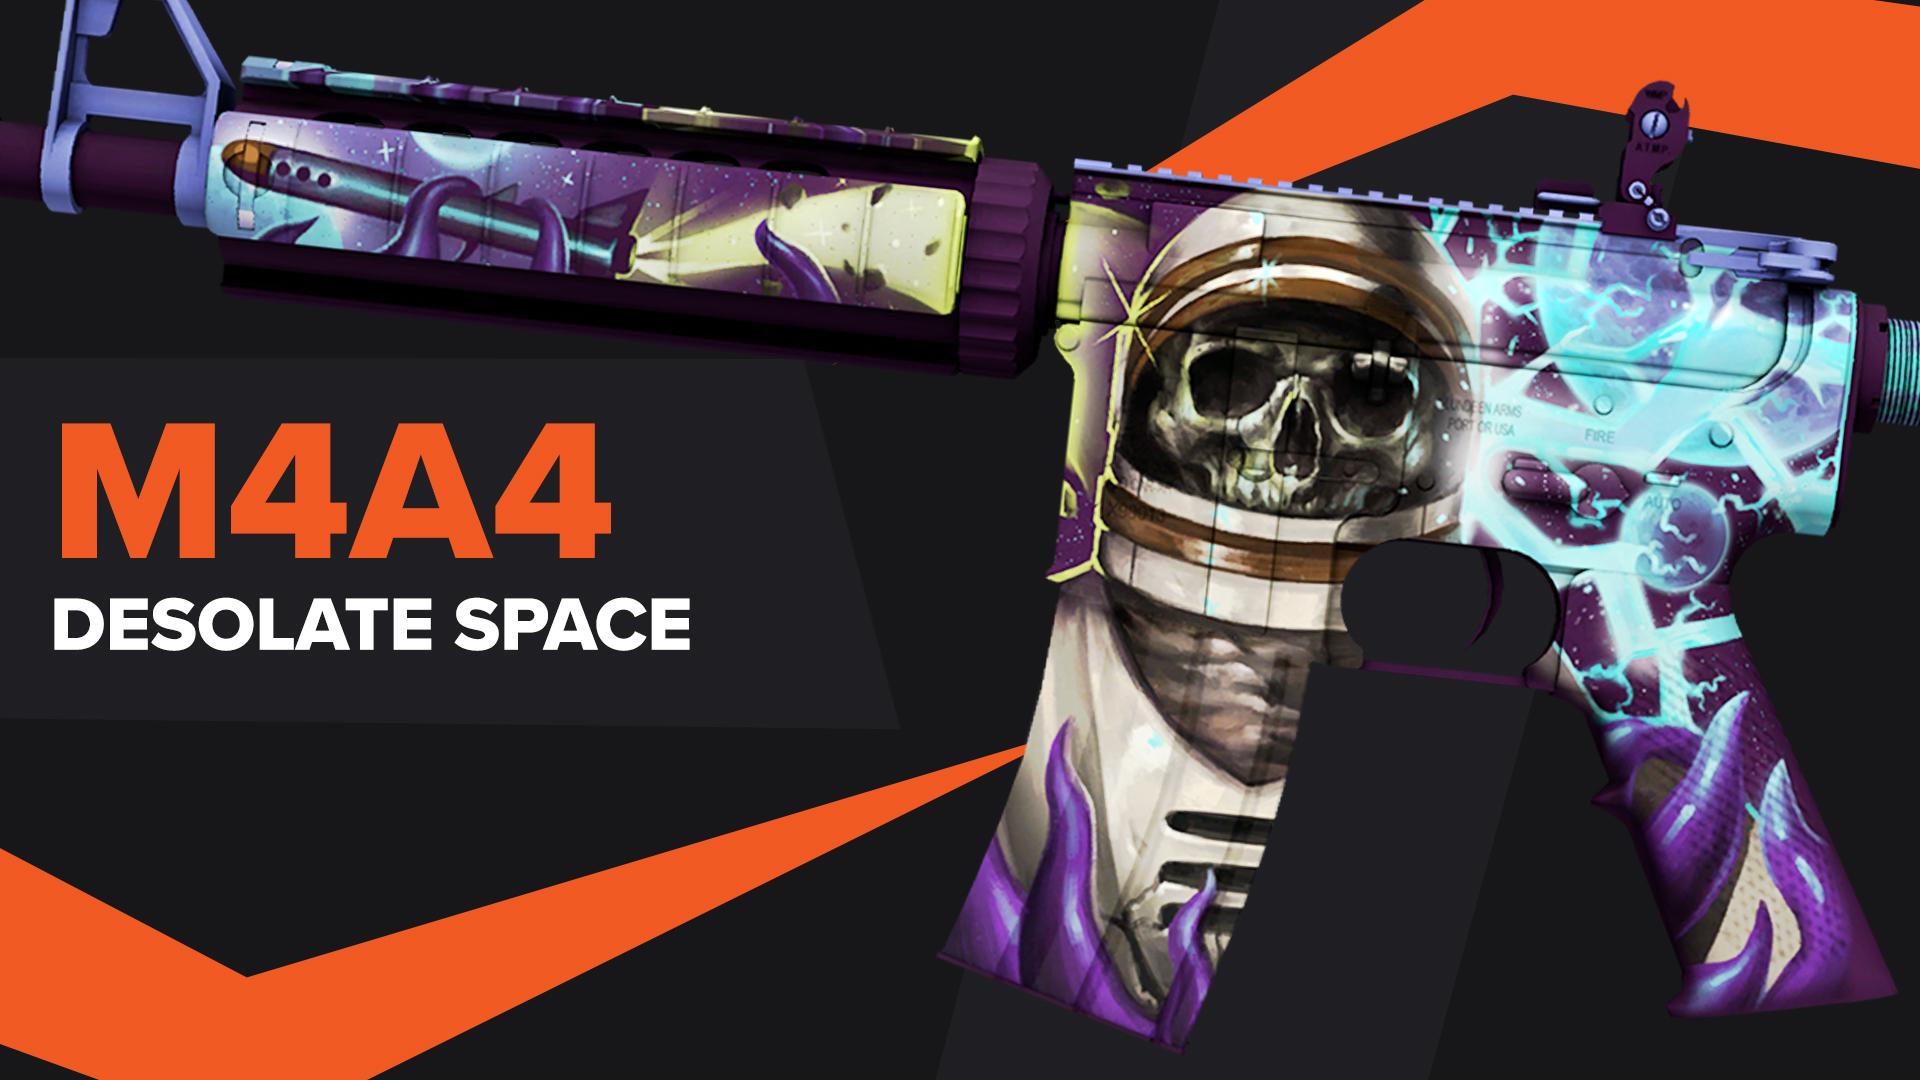 Desolate Space CSGO Skin M4A4